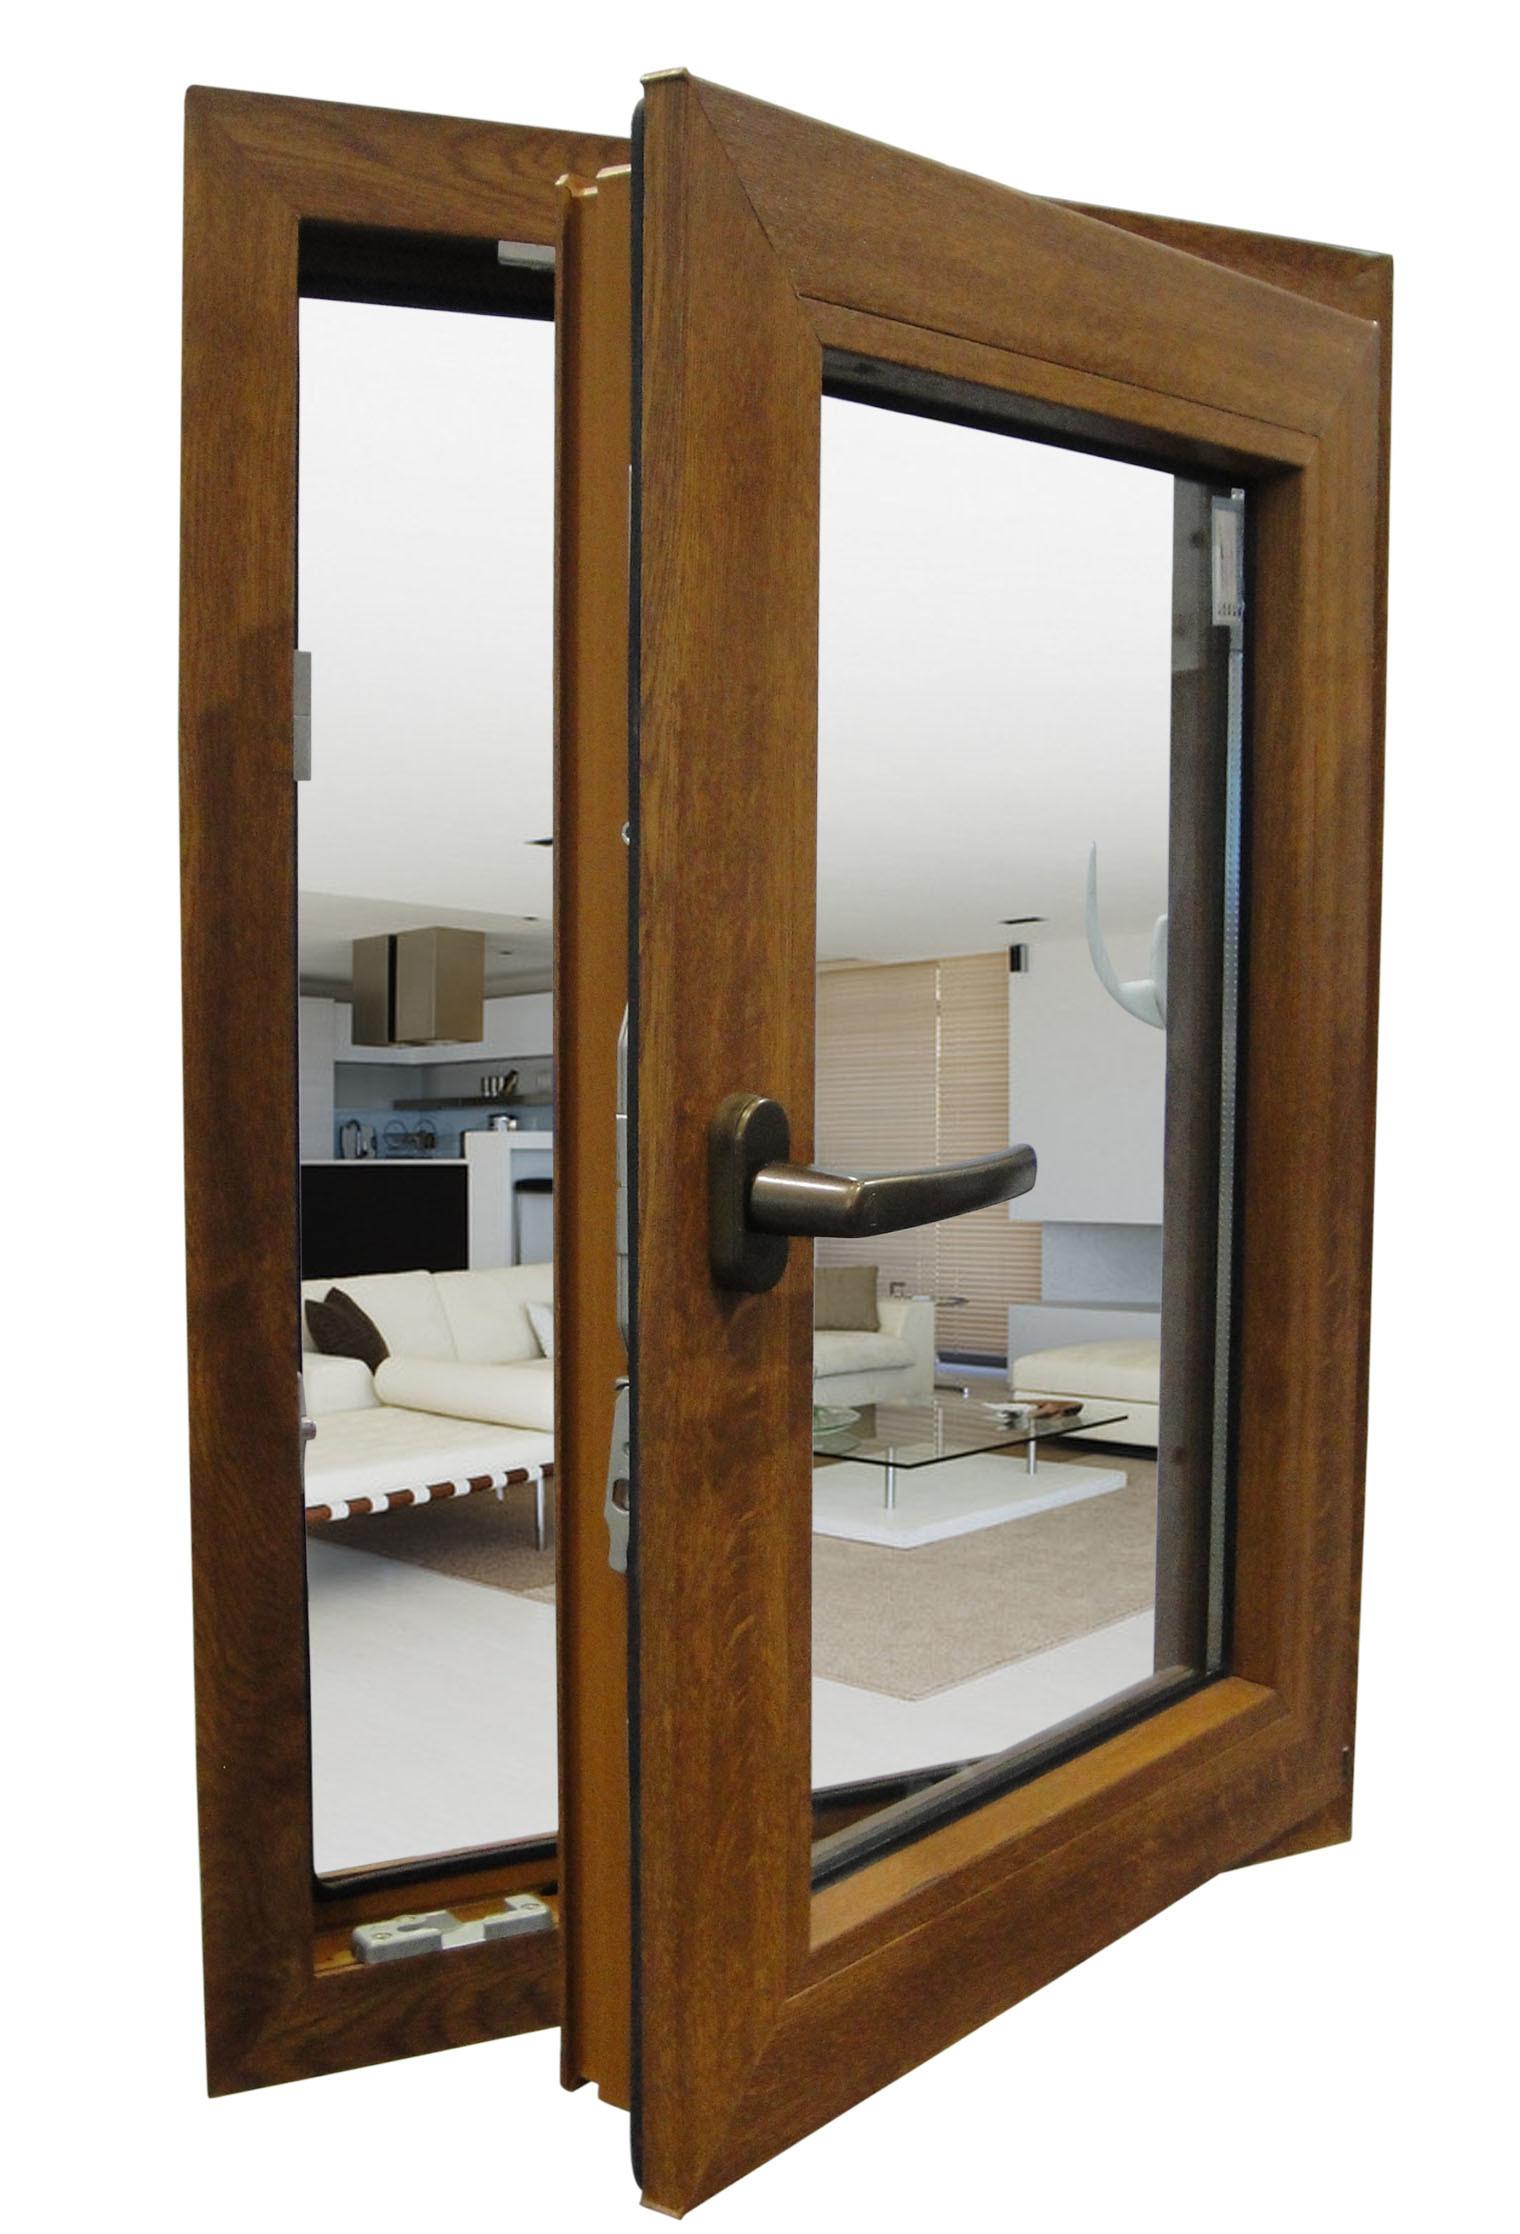 Aluminum window aluminum window manufacturers for Window brands